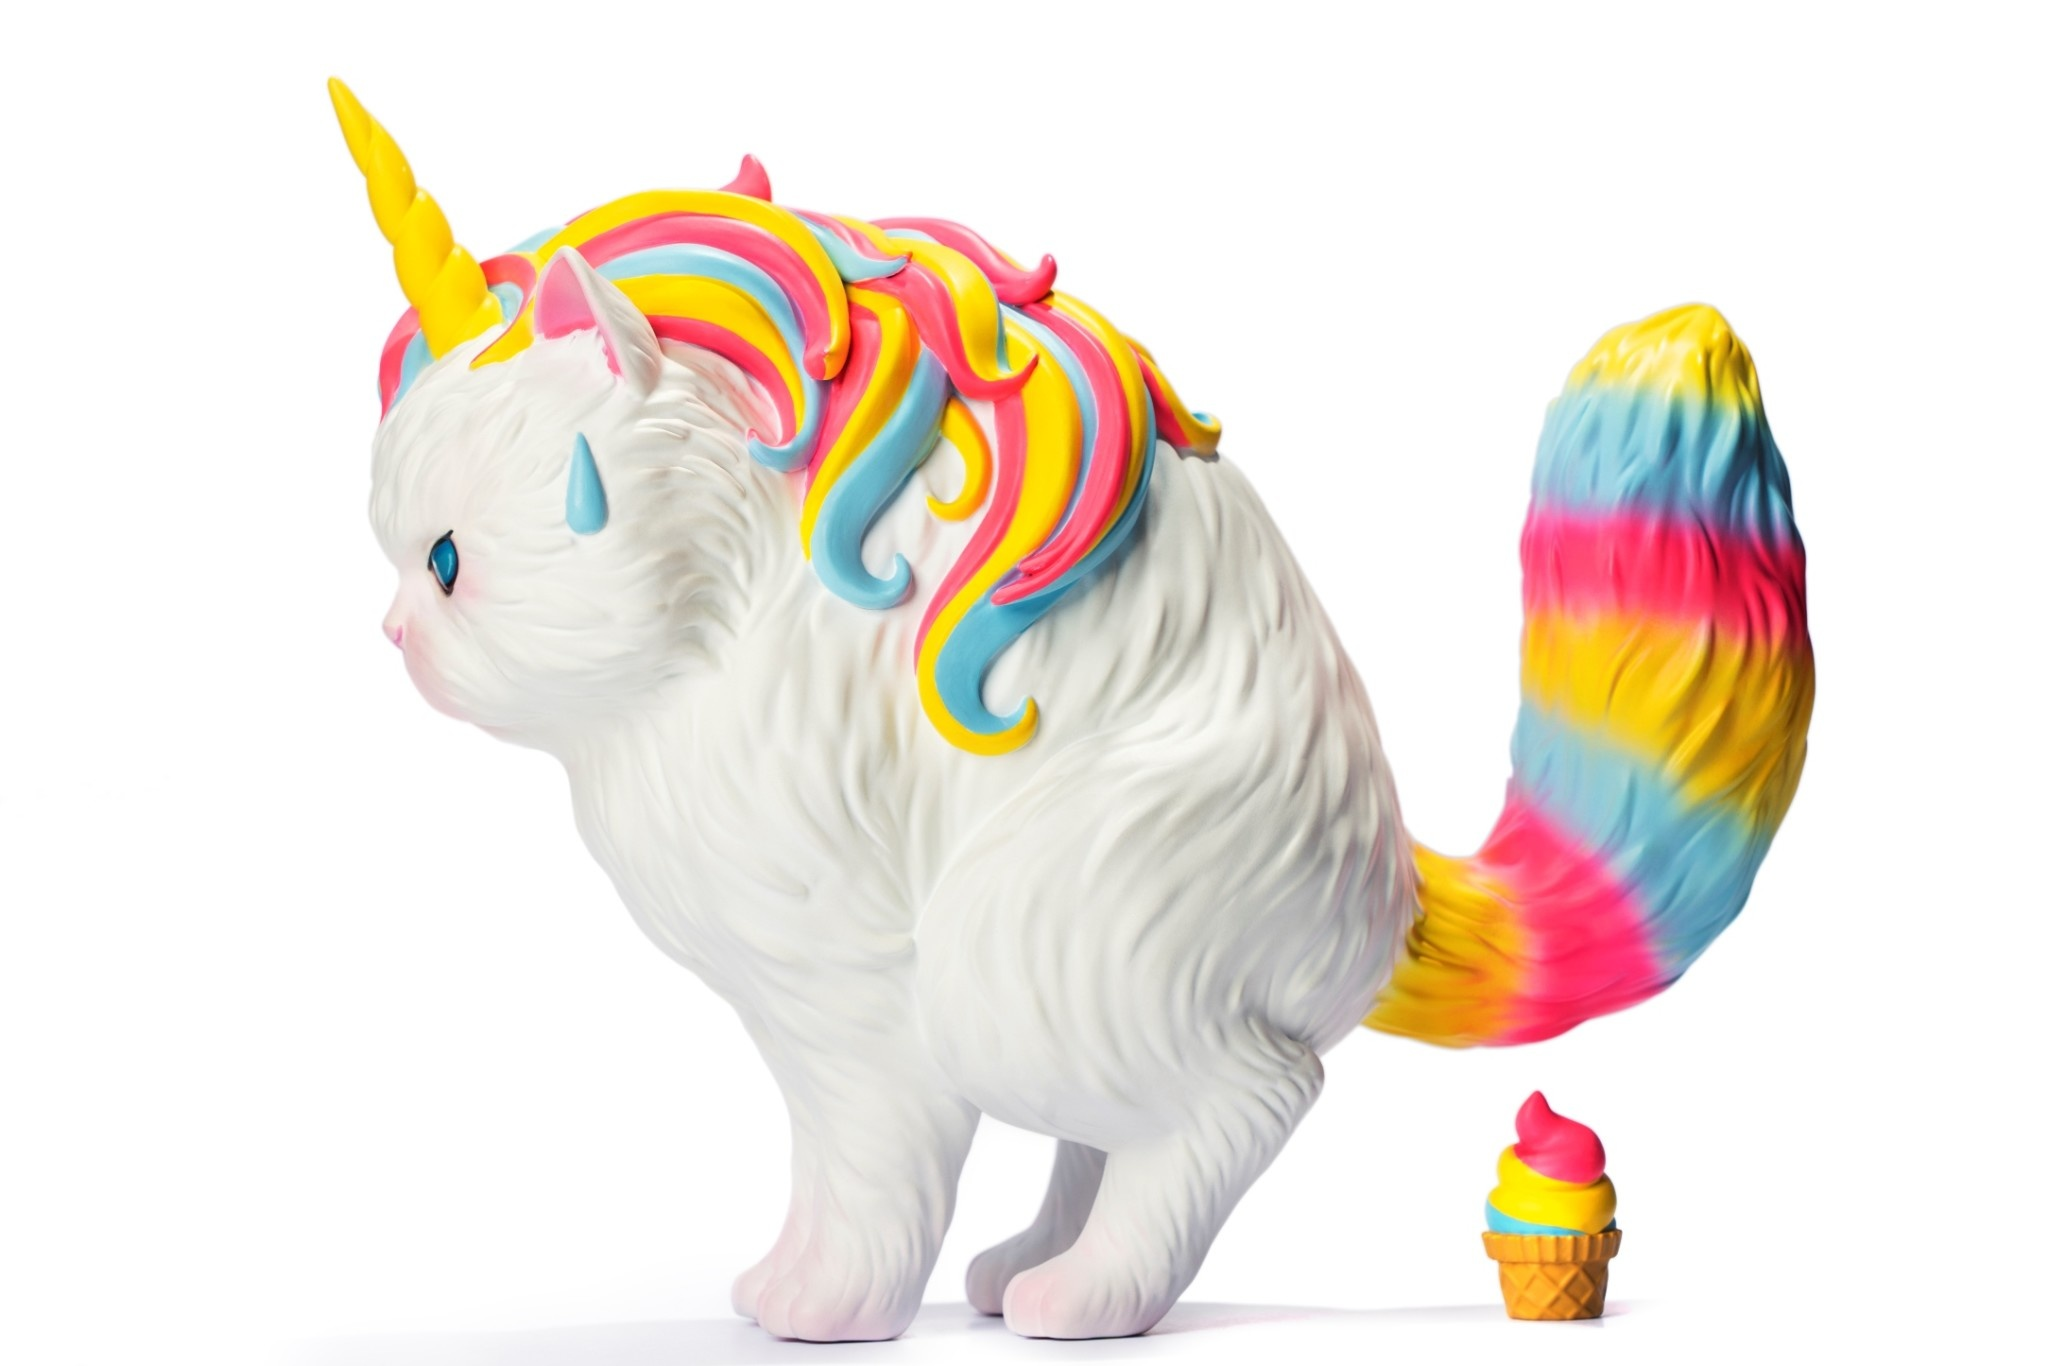 soap studios pre order:  Strange Cat Family: Unicat - Rainbow Ice Cream 15 cm Vinyl Figure